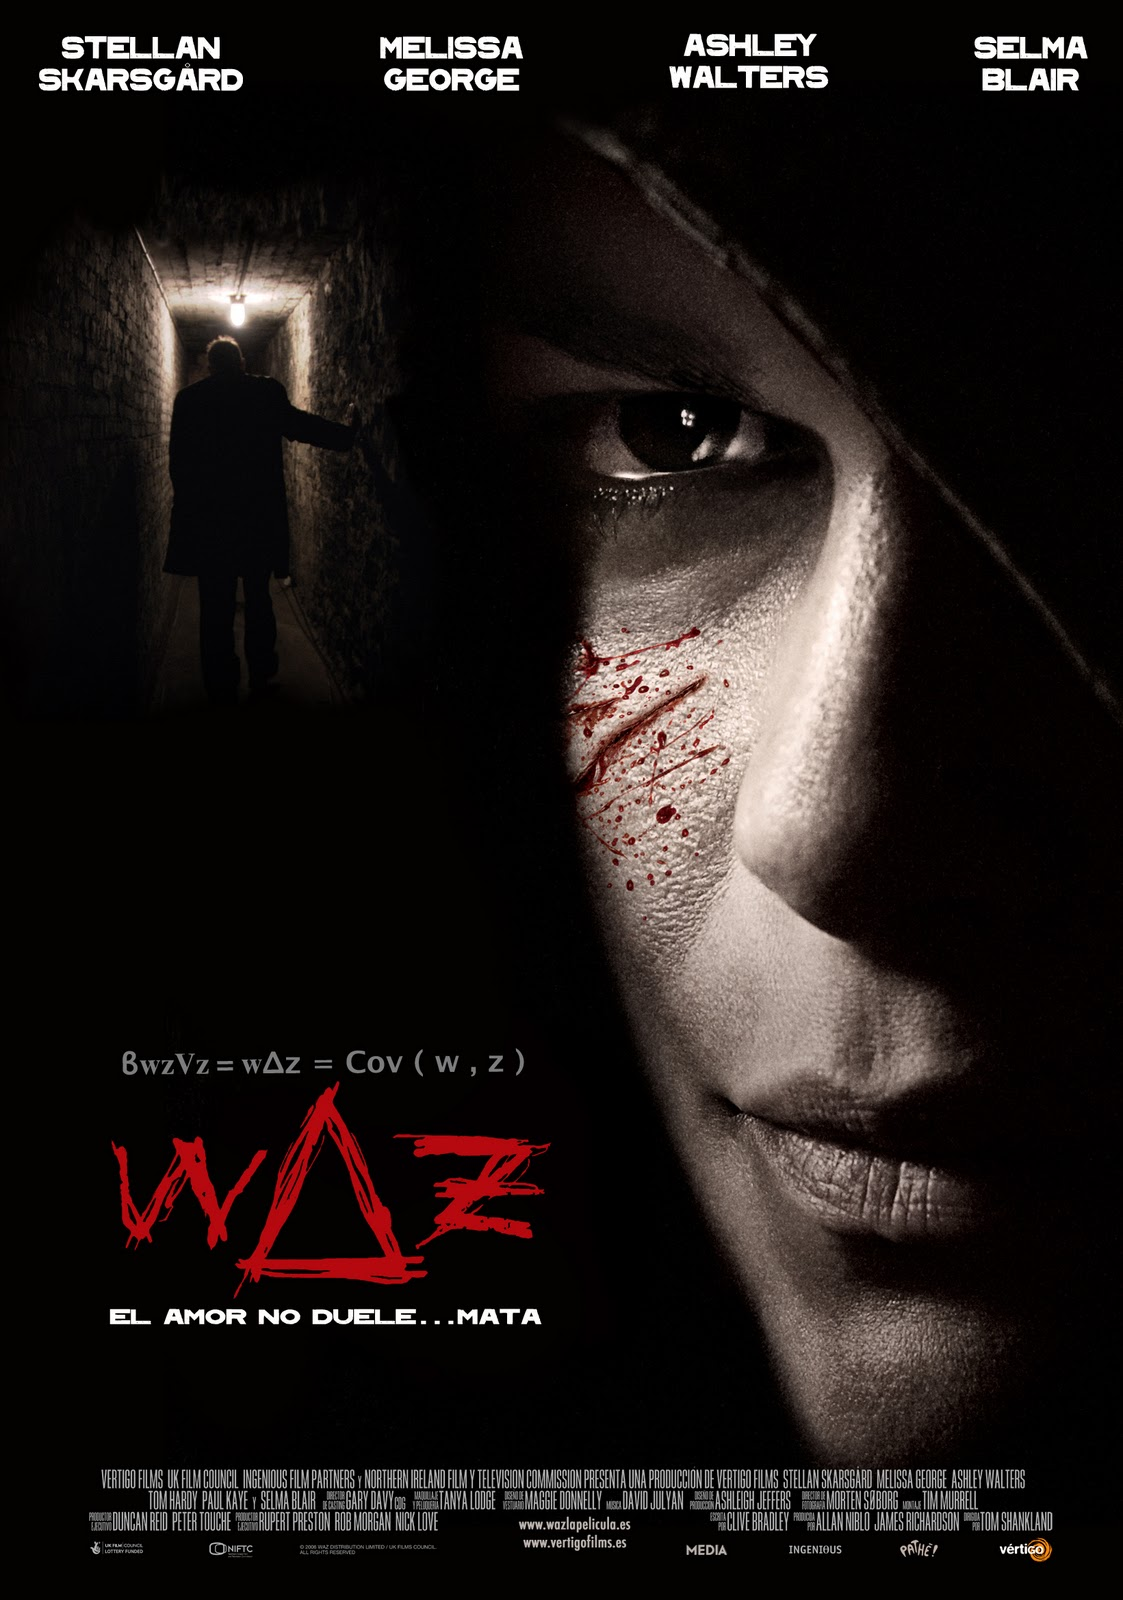 http://4.bp.blogspot.com/-VOmPtMlkKO4/TZ2k8Yg1STI/AAAAAAAAAy0/xEd3bW9bhOQ/s1600/waz-poster.jpg